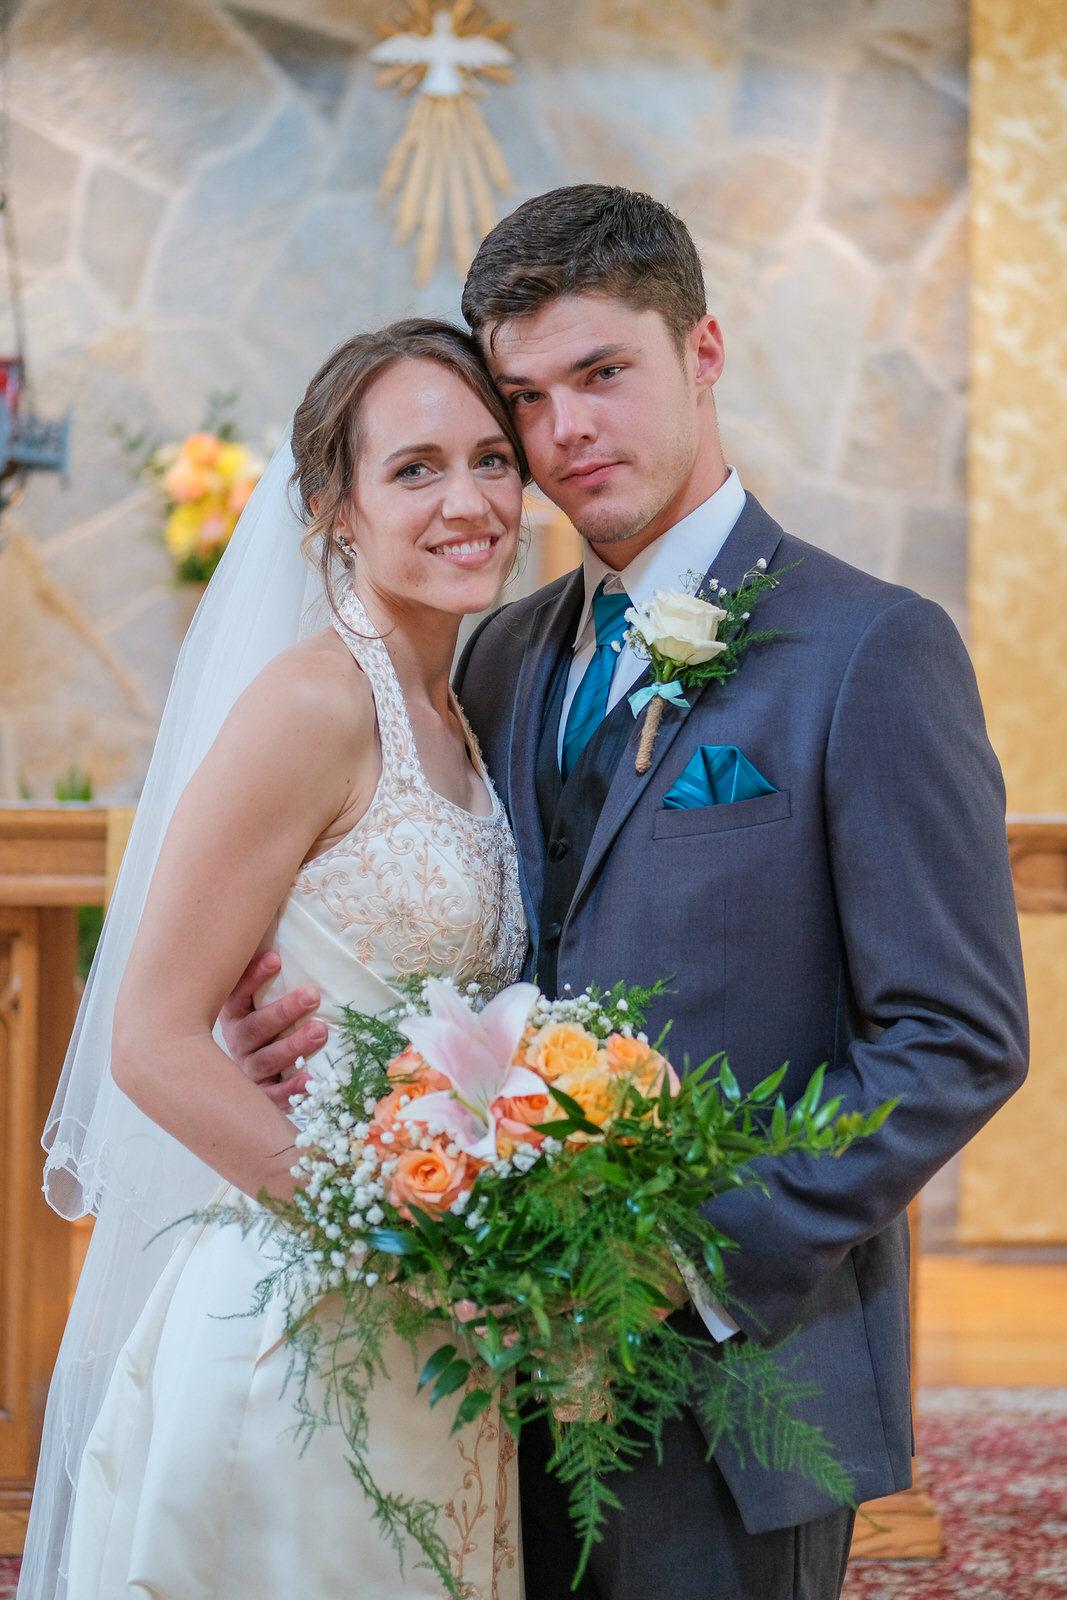 southern-nh-wedding-photography-663-1.jpg